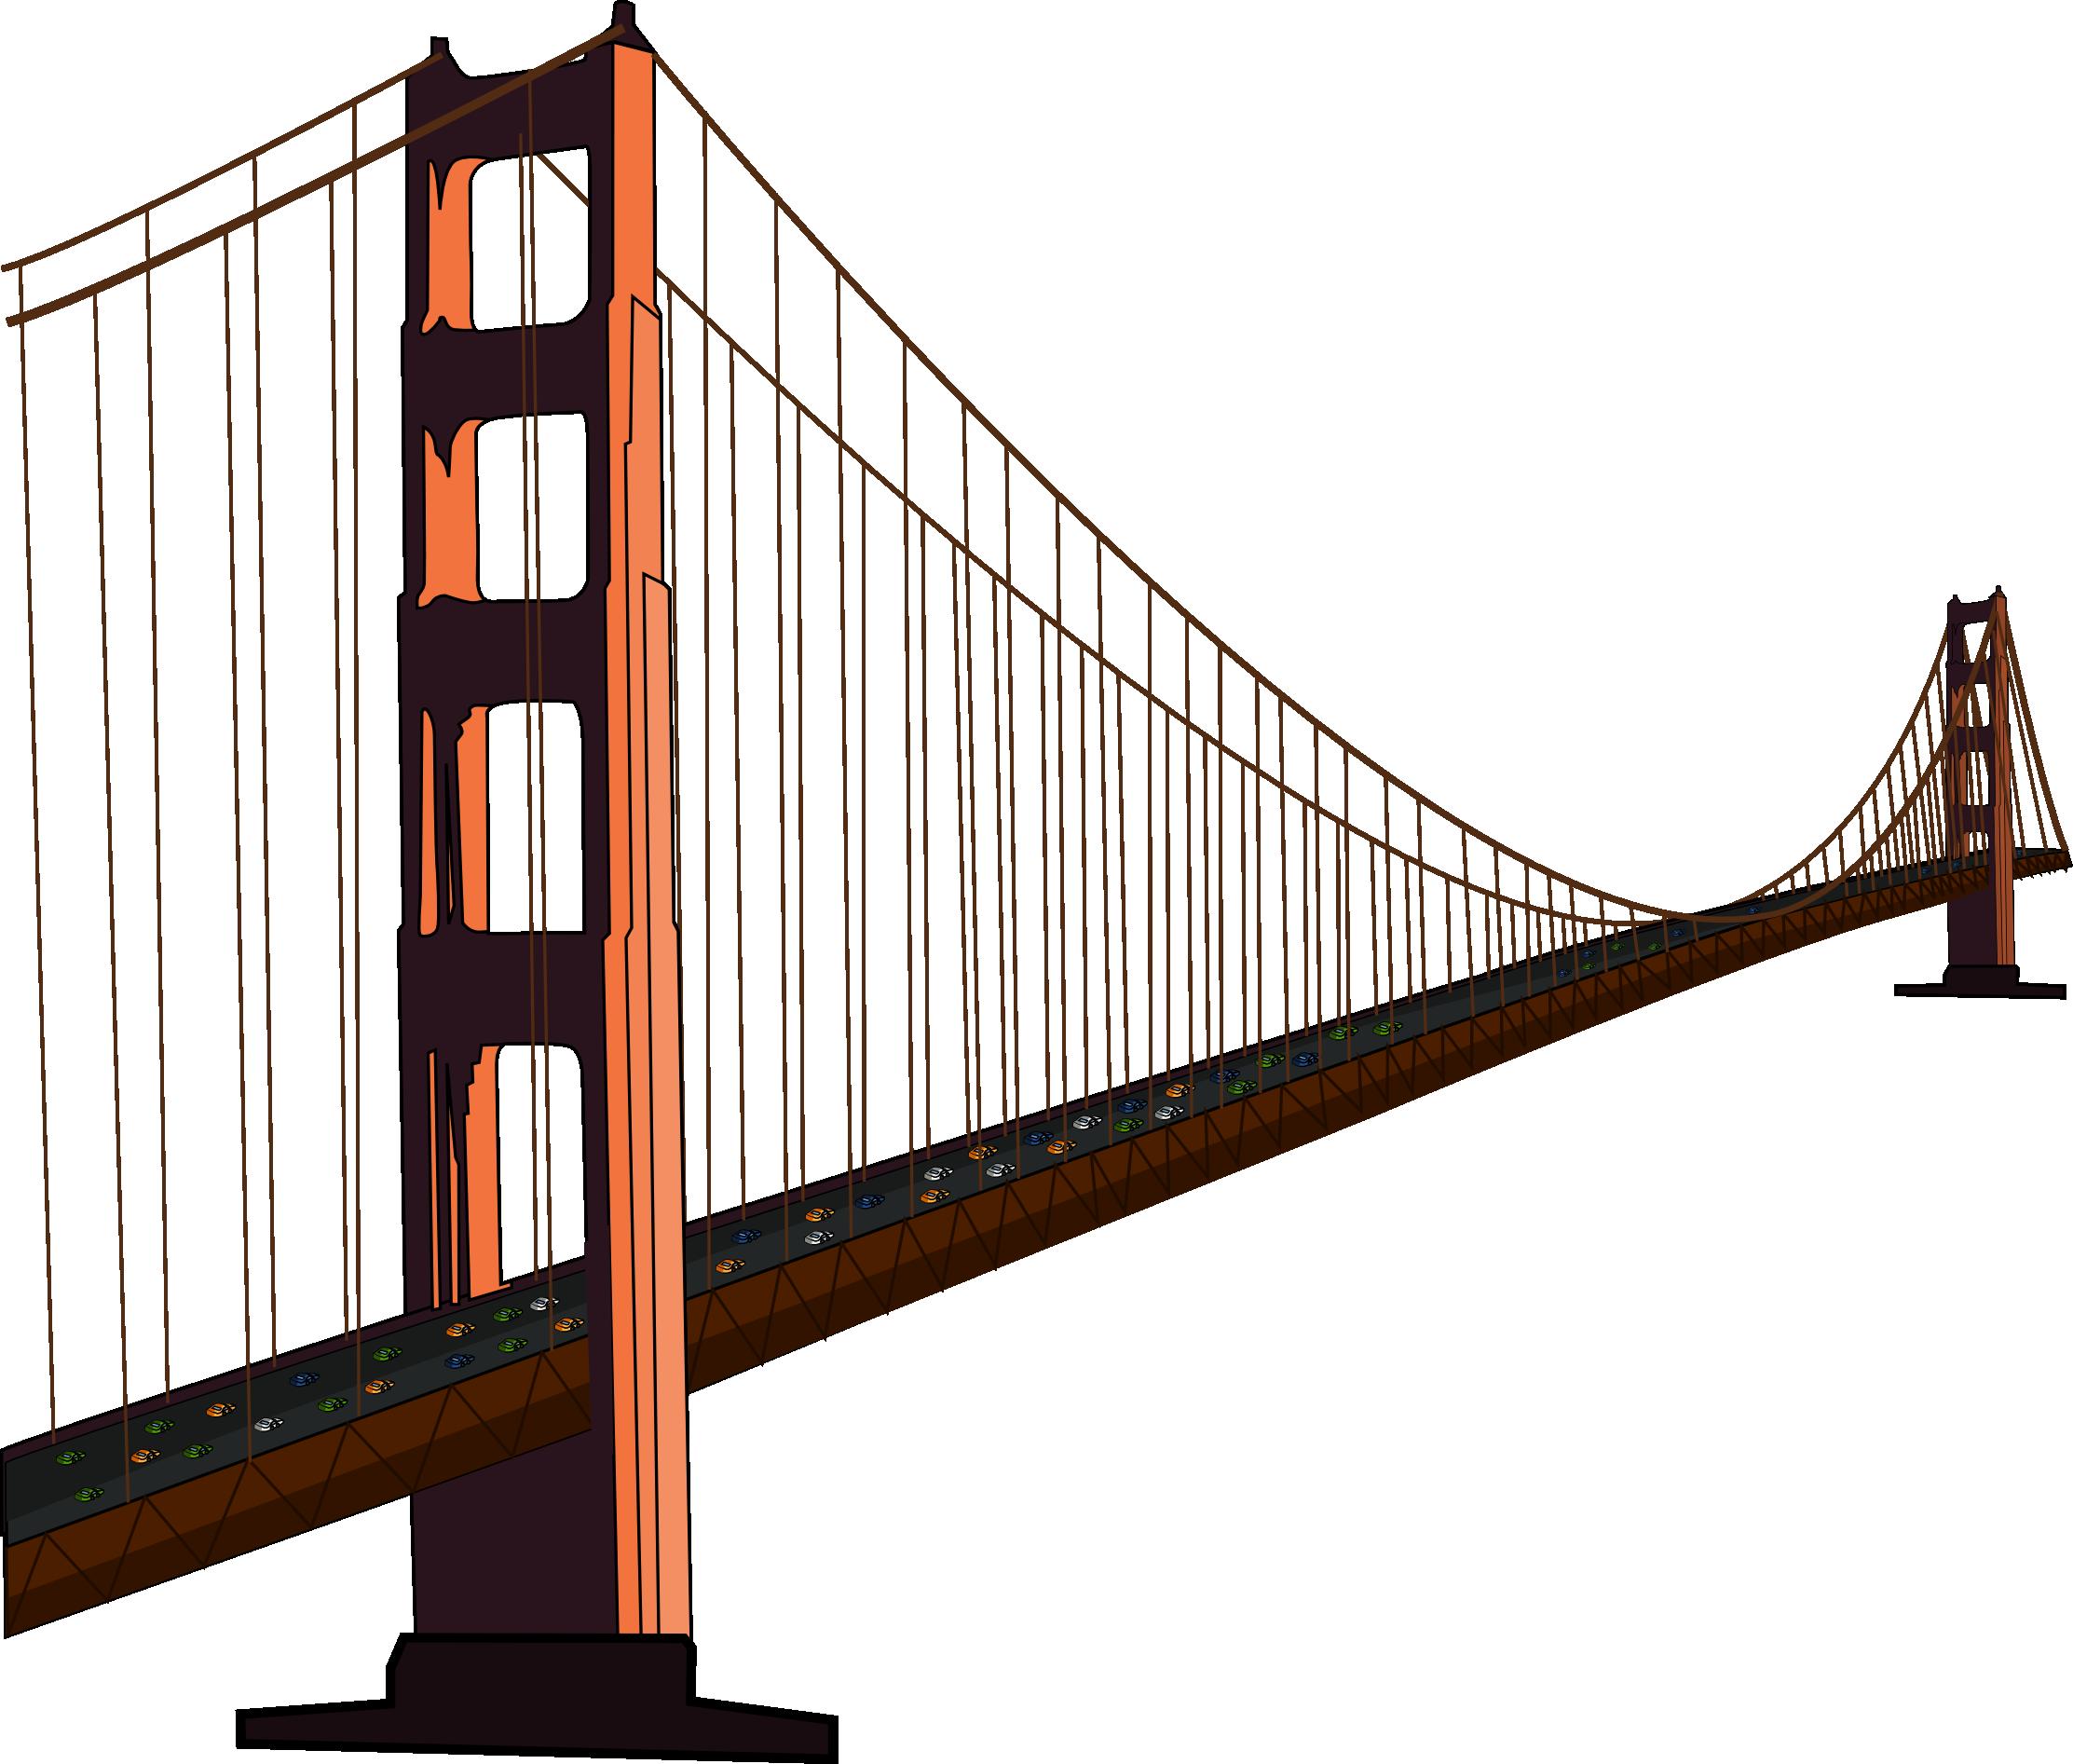 Pumpkin bridge clipart vector freeuse library Free Golden Gate Bridge Clip Art | clip art 2 | Pinterest | Golden ... vector freeuse library